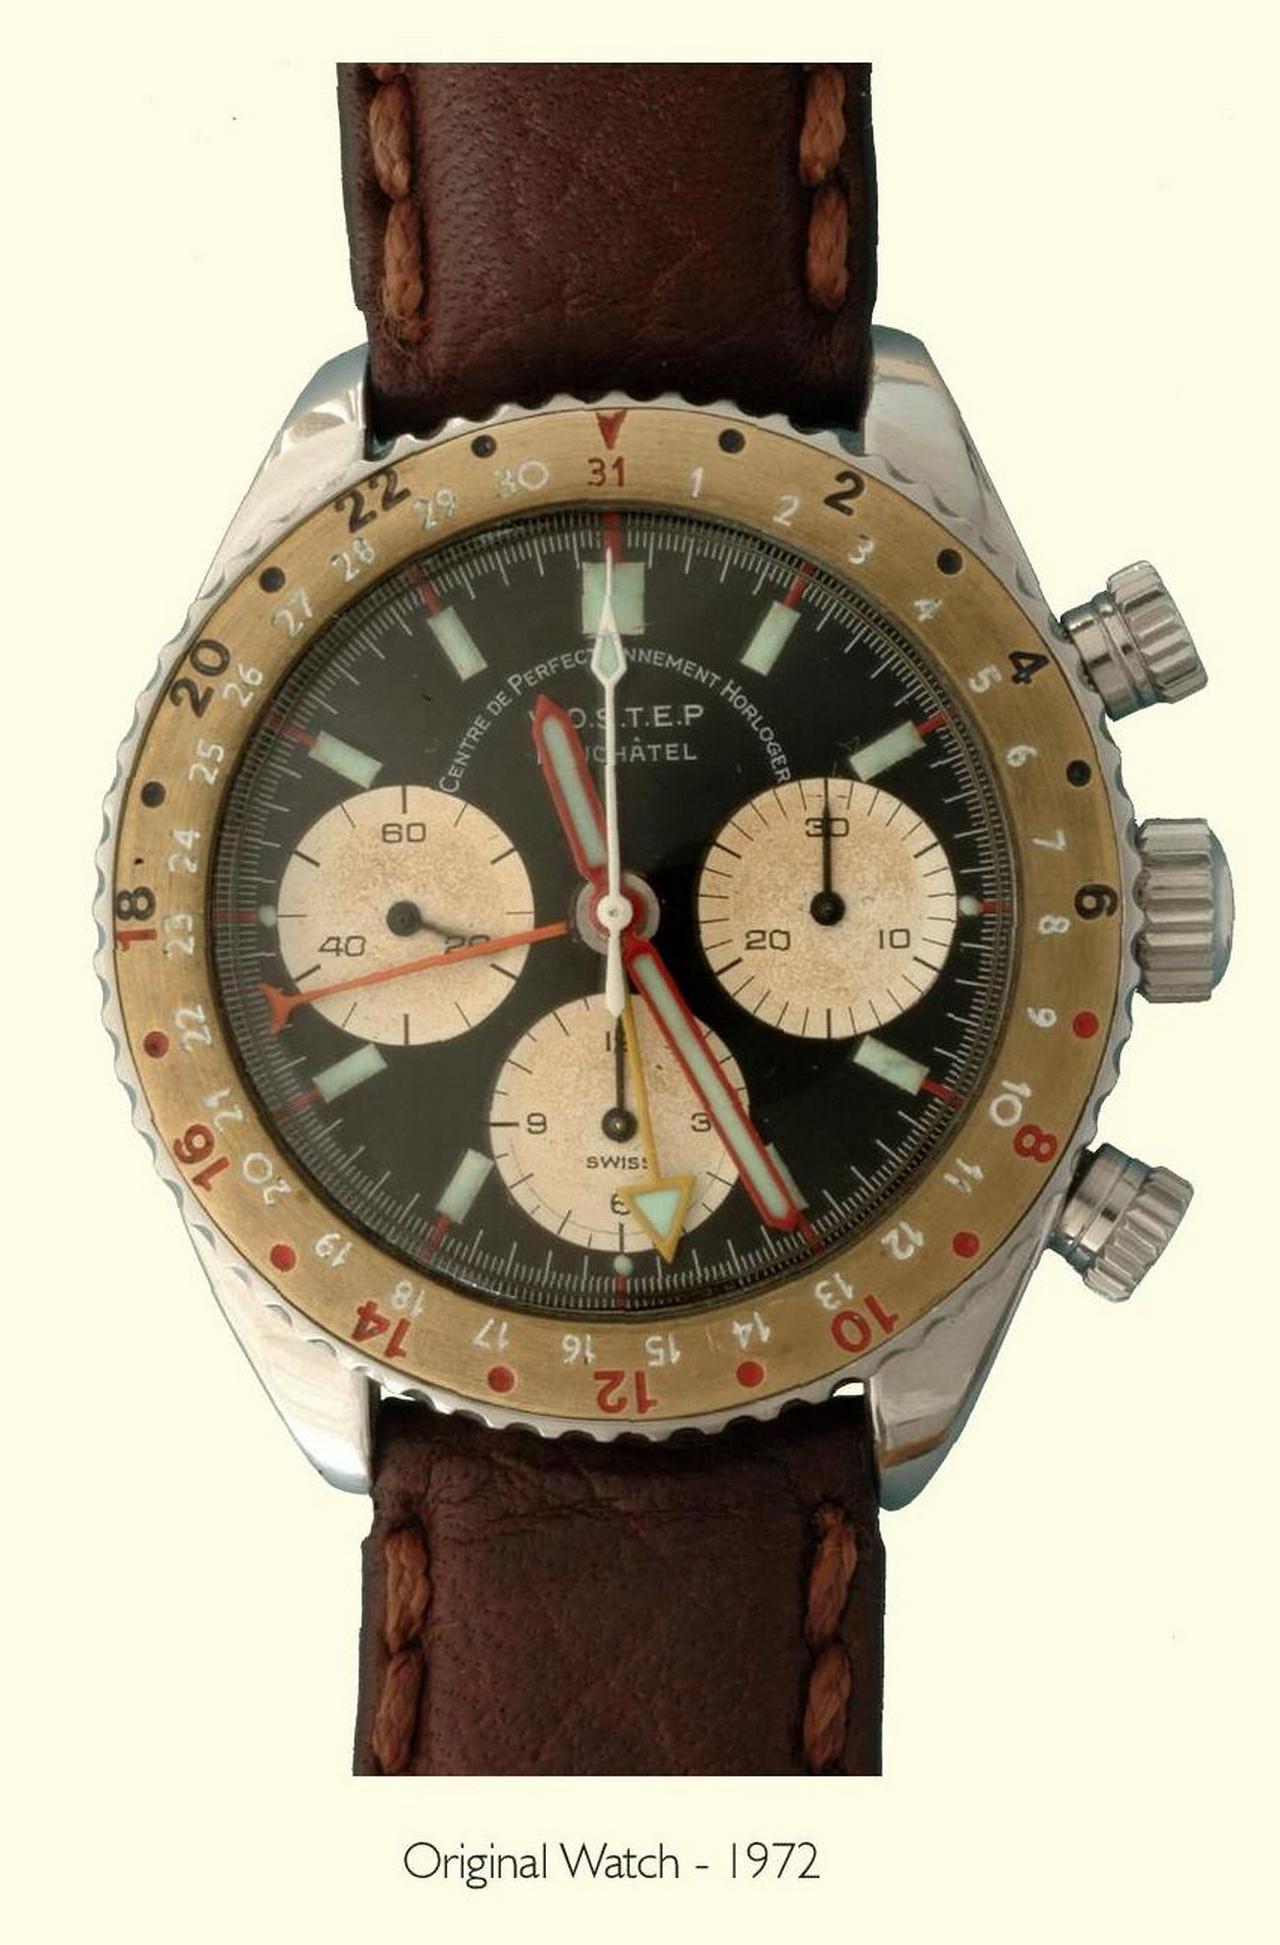 peter-roberts-concentrique-grand-complication-5_0-100_7